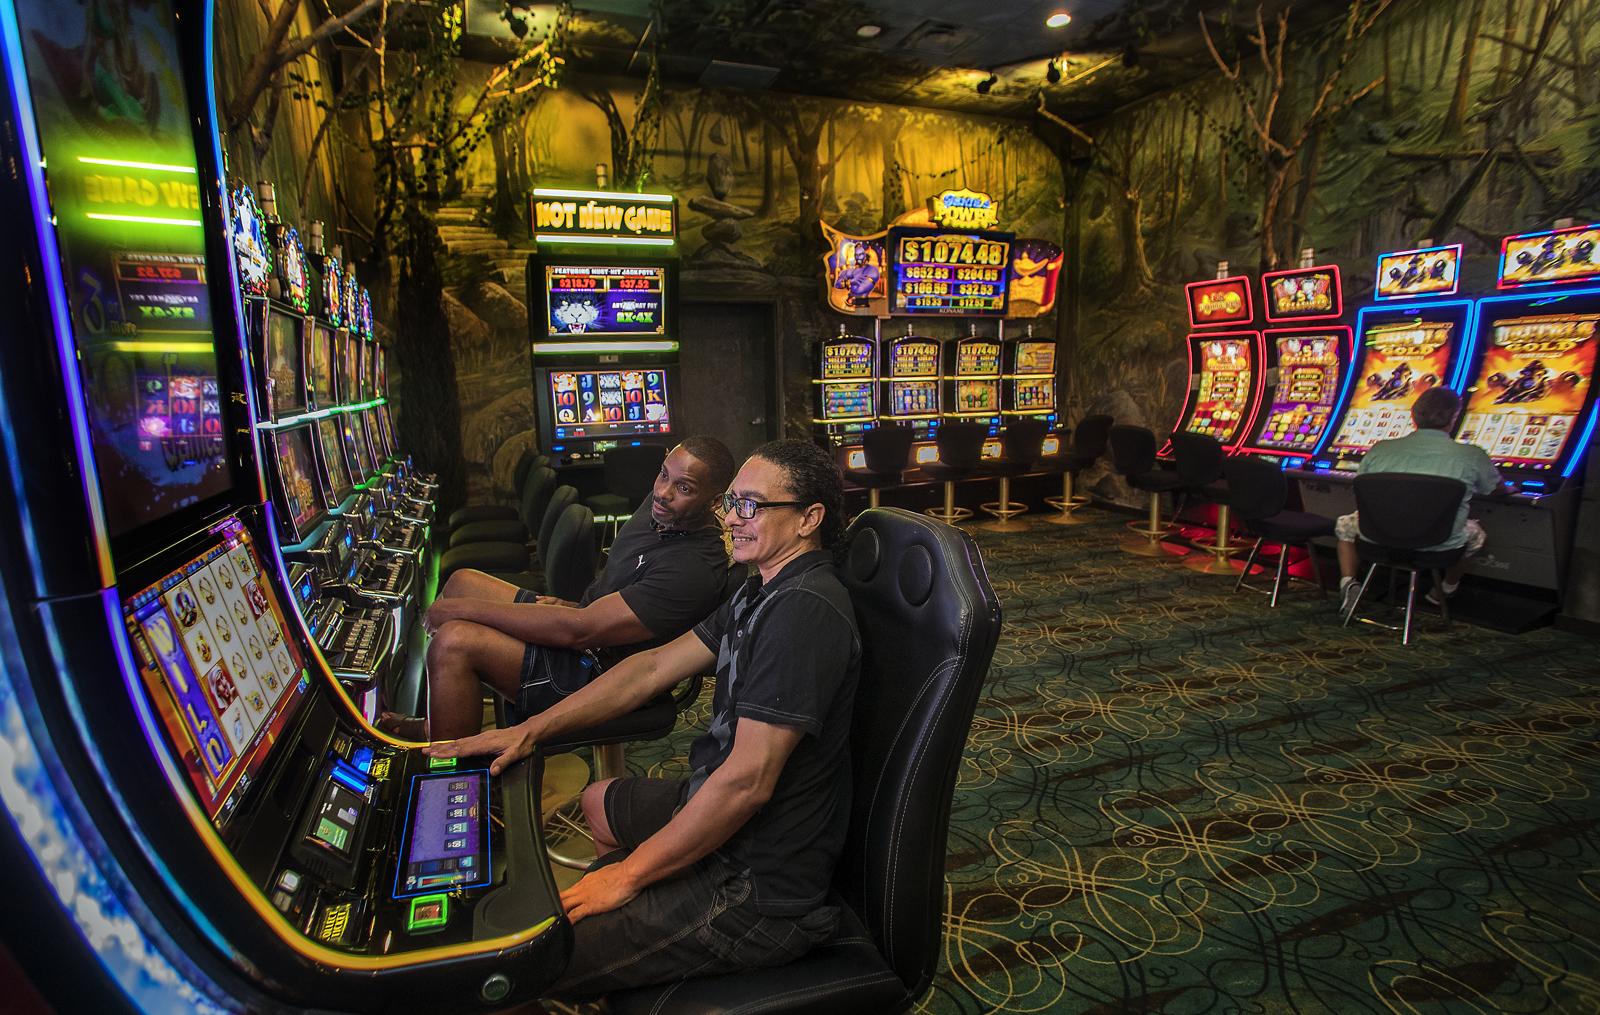 Emerald casino inc online merchant account gambling